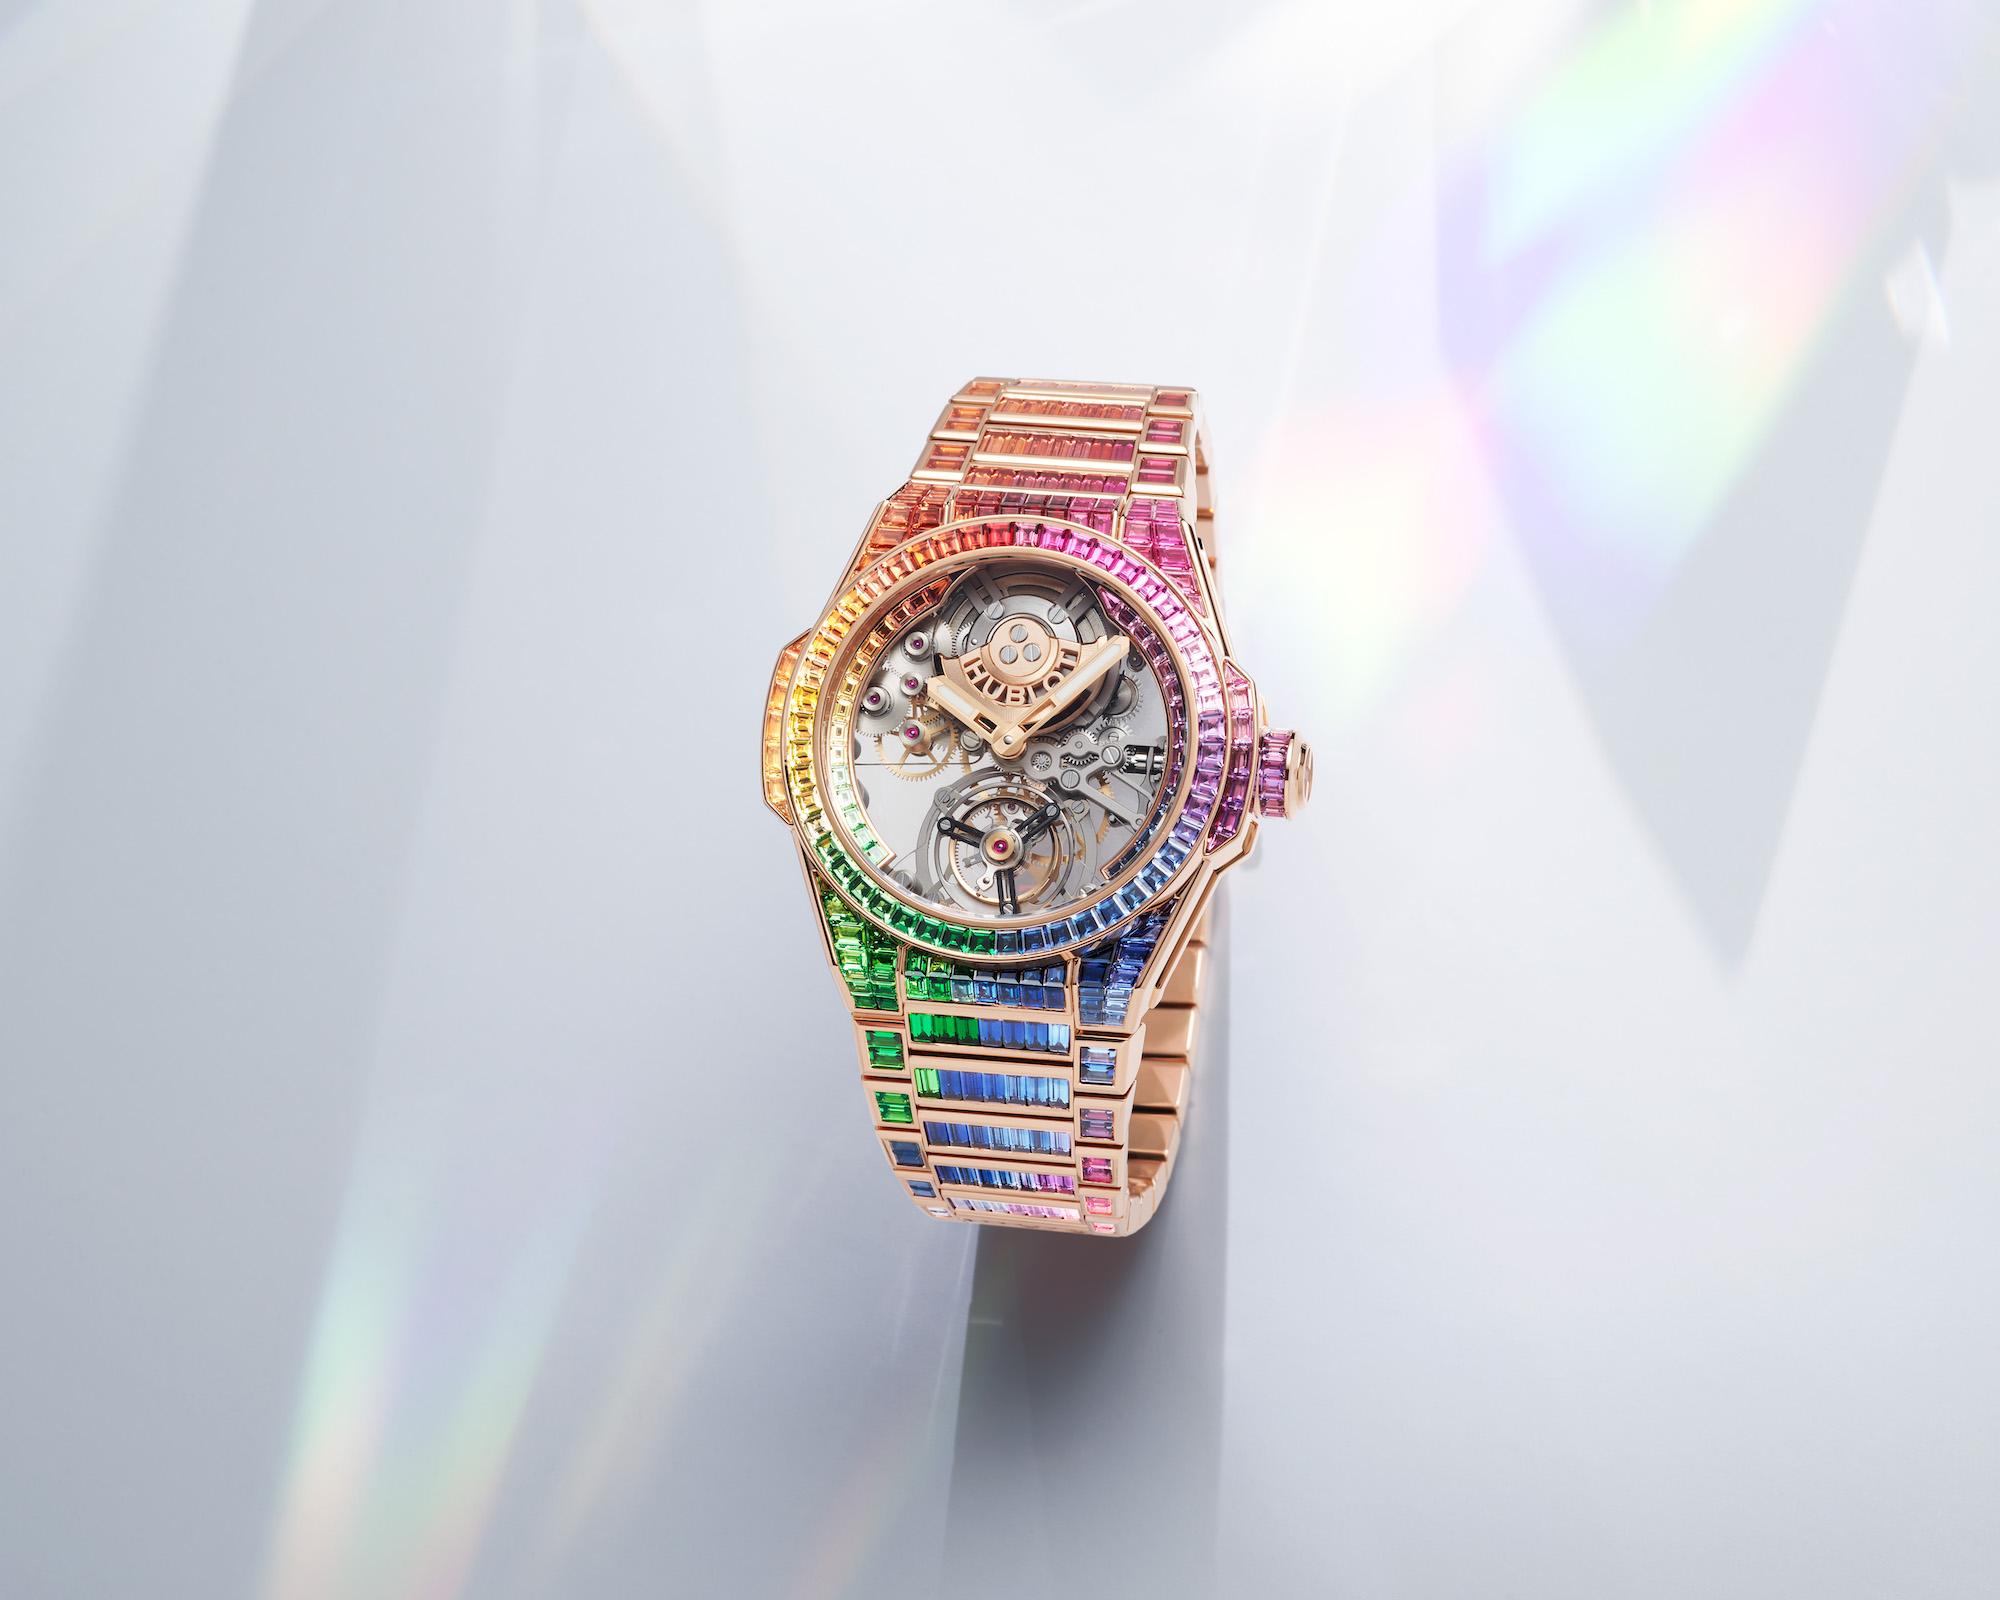 Hublot Big Bang Integral Tourbillon Rainbow 455.OX.9900.OX.9999 Lifestyle